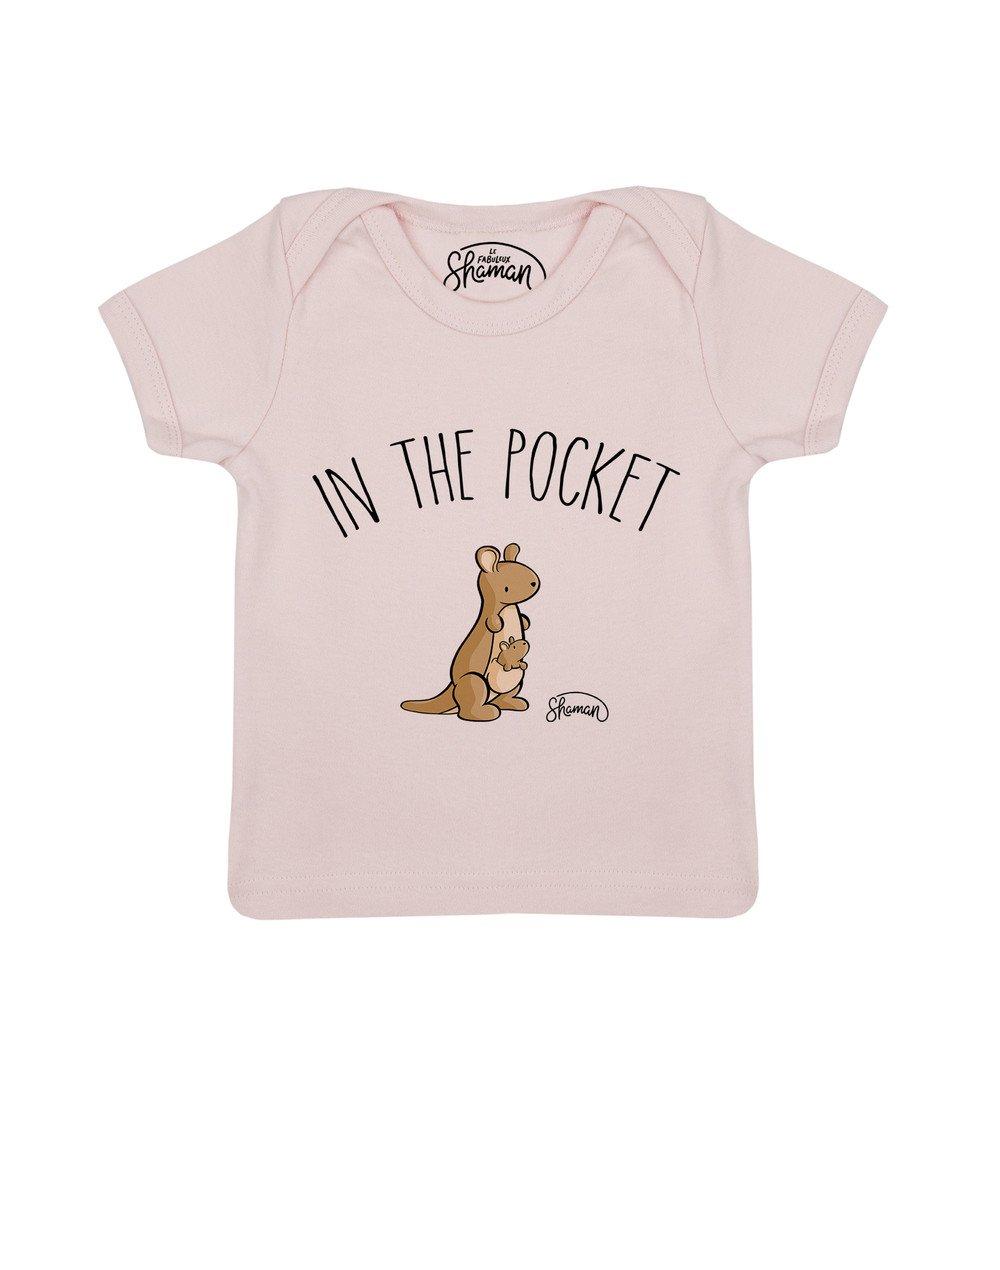 Tee shirt Pocket